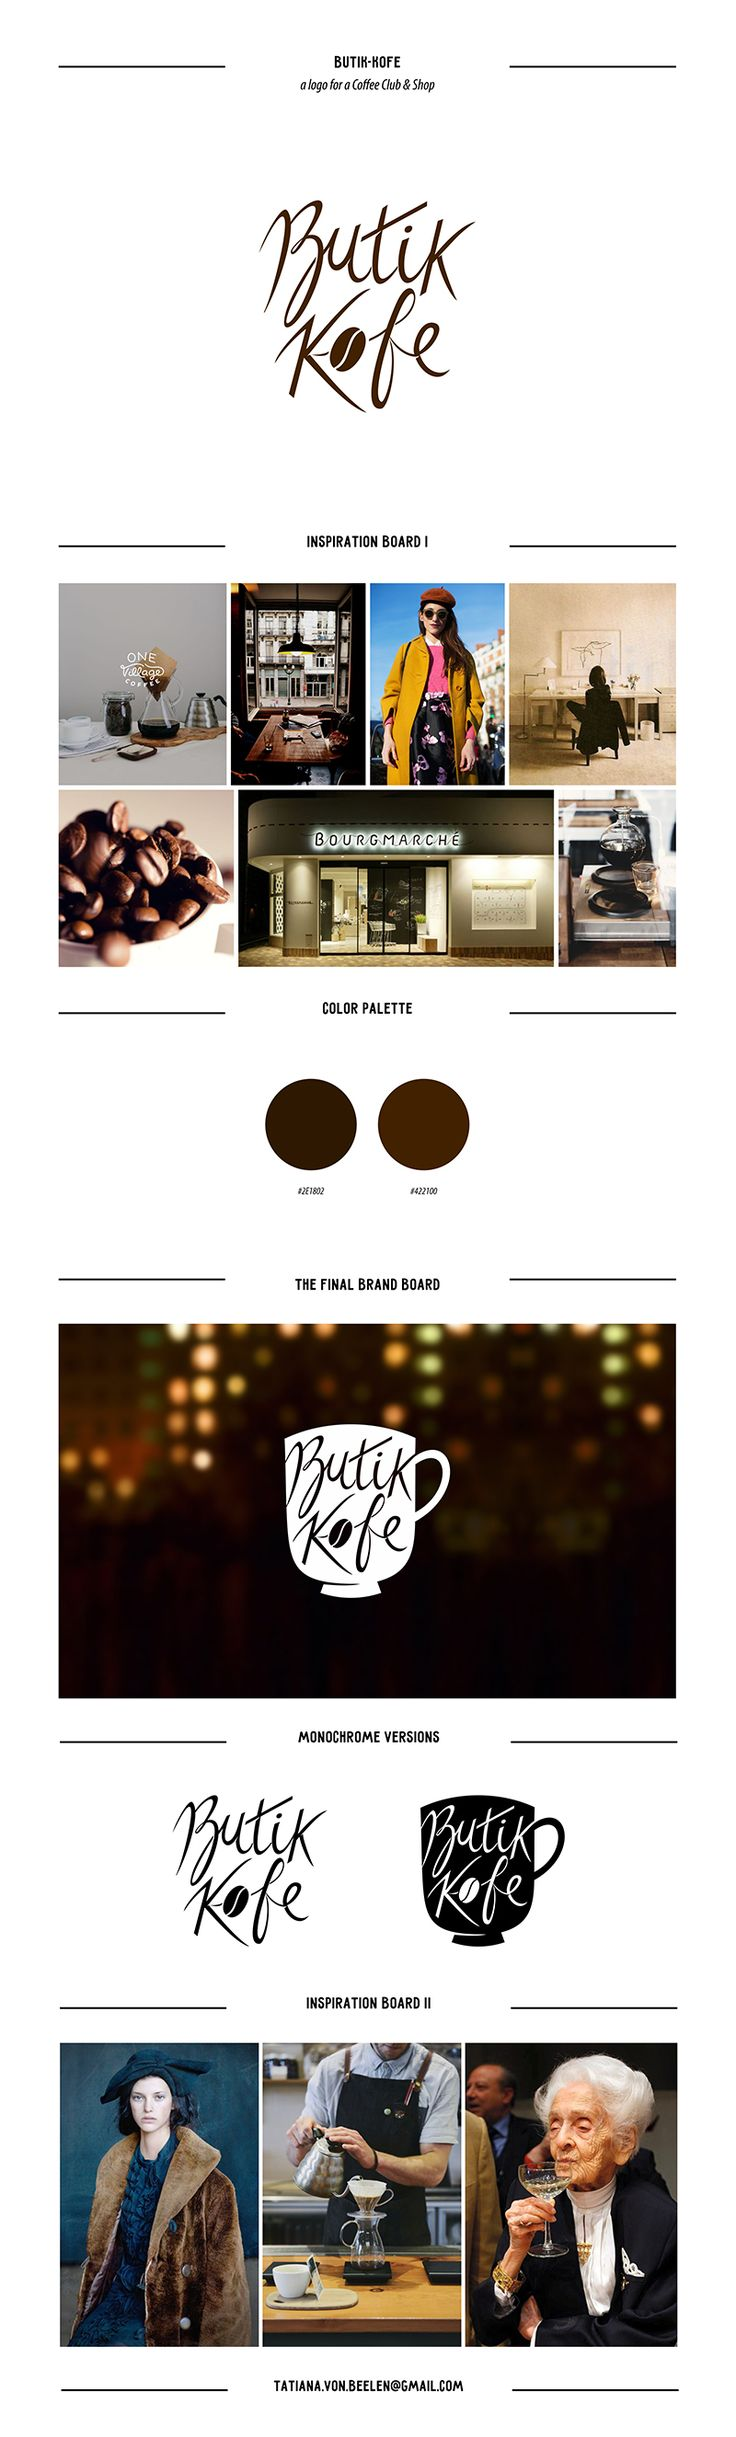 Tatiana-von-Beelen-Final-Brand-Board | #corporate #branding #creative #logo #personalized #identity #design #corporatedesign #coffee #coffeeshop